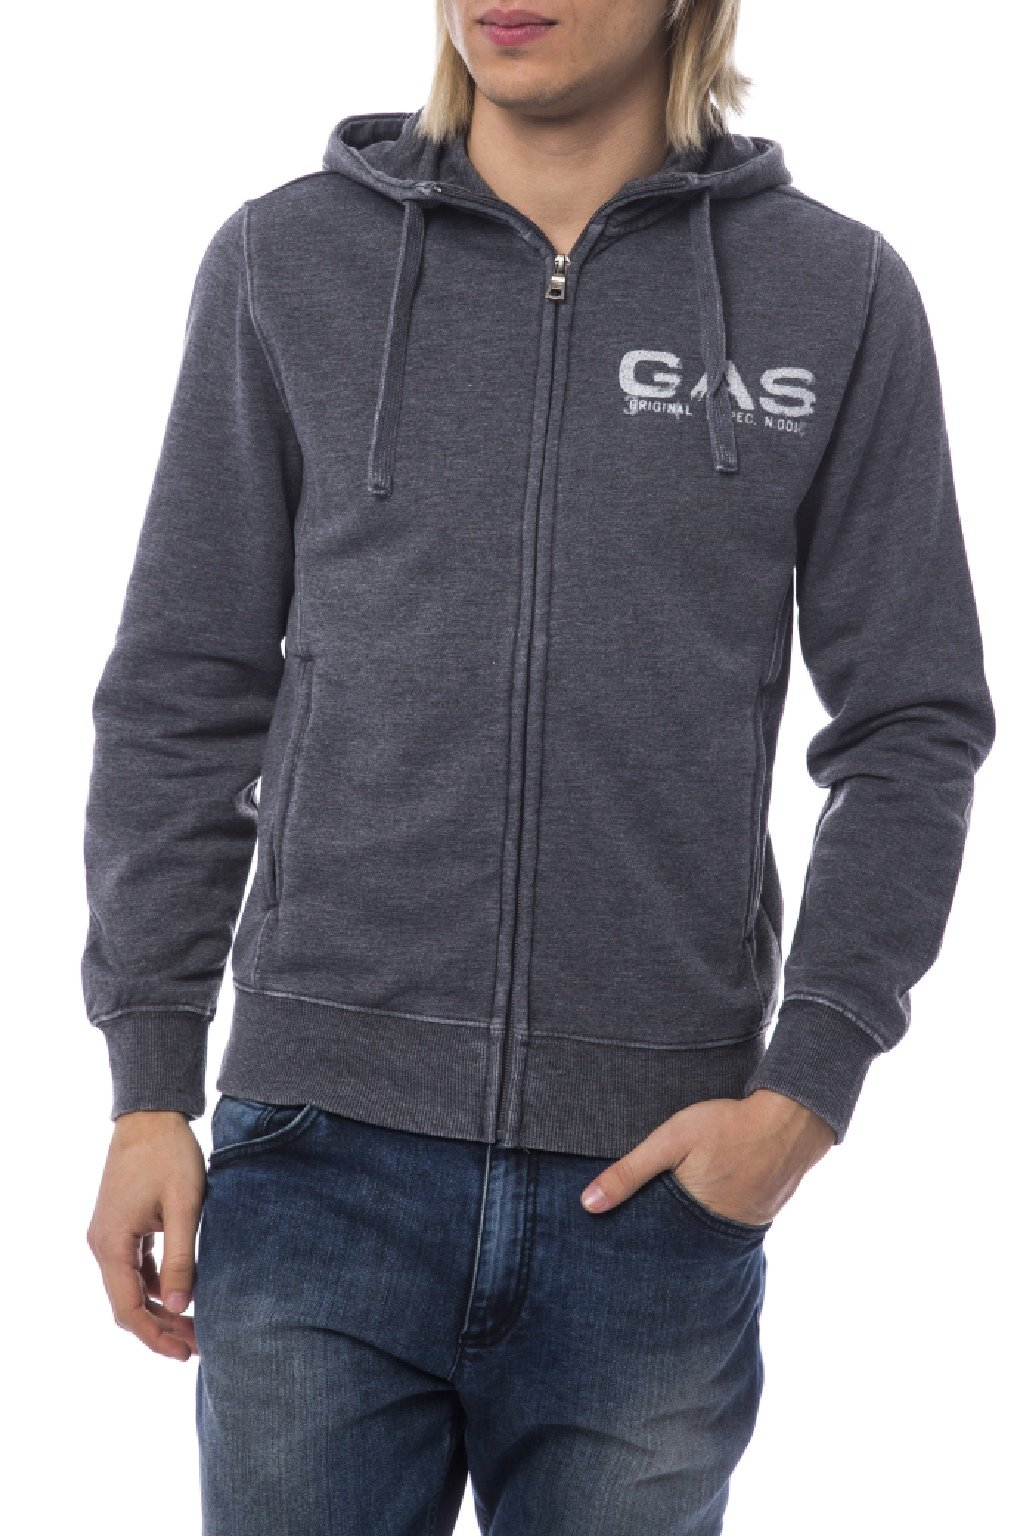 znackova panska mikina s kapuci gas jeans (1)